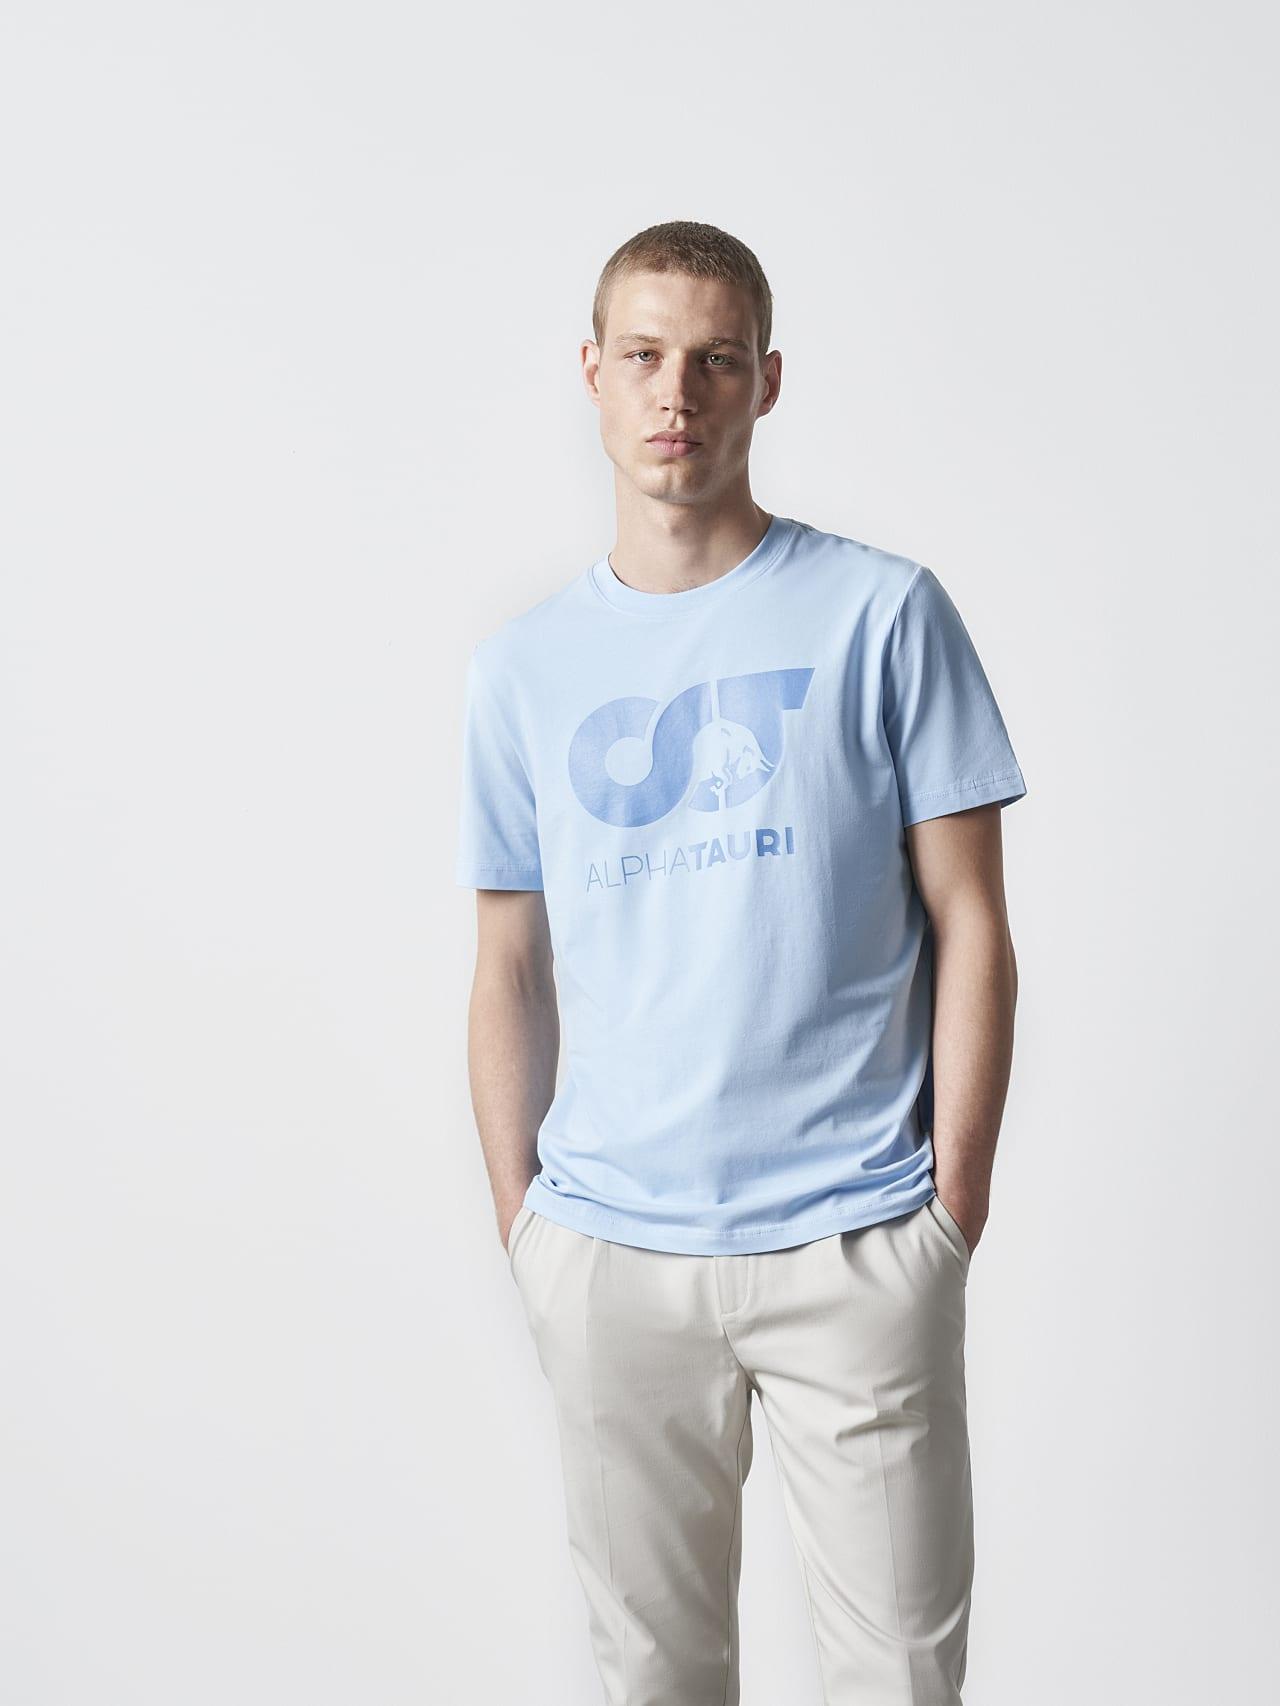 JERO V2.Y4.02 Signature Logo T-Shirt light blue Model shot Alpha Tauri